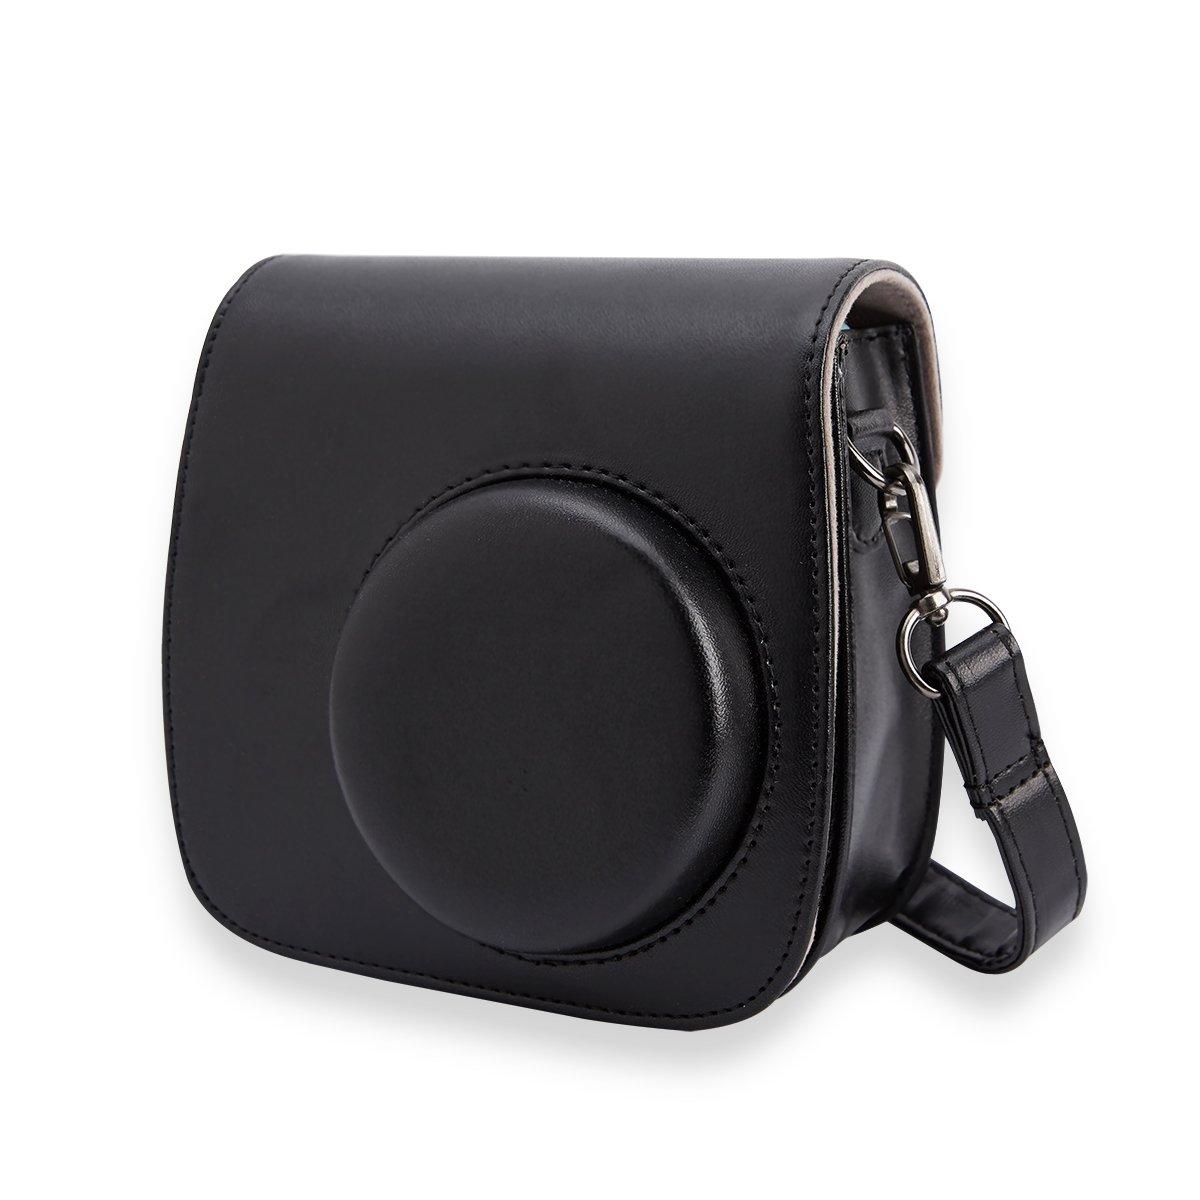 Green, Black K 5 for Pantex 645D K 500 K 3 K x DSLR Camera and Screen Protector and Mini Tripod K 7 K r K 50 K20D K 5 II K 5 Iis K 30 Sparta Travel Nylon Backpack Bag